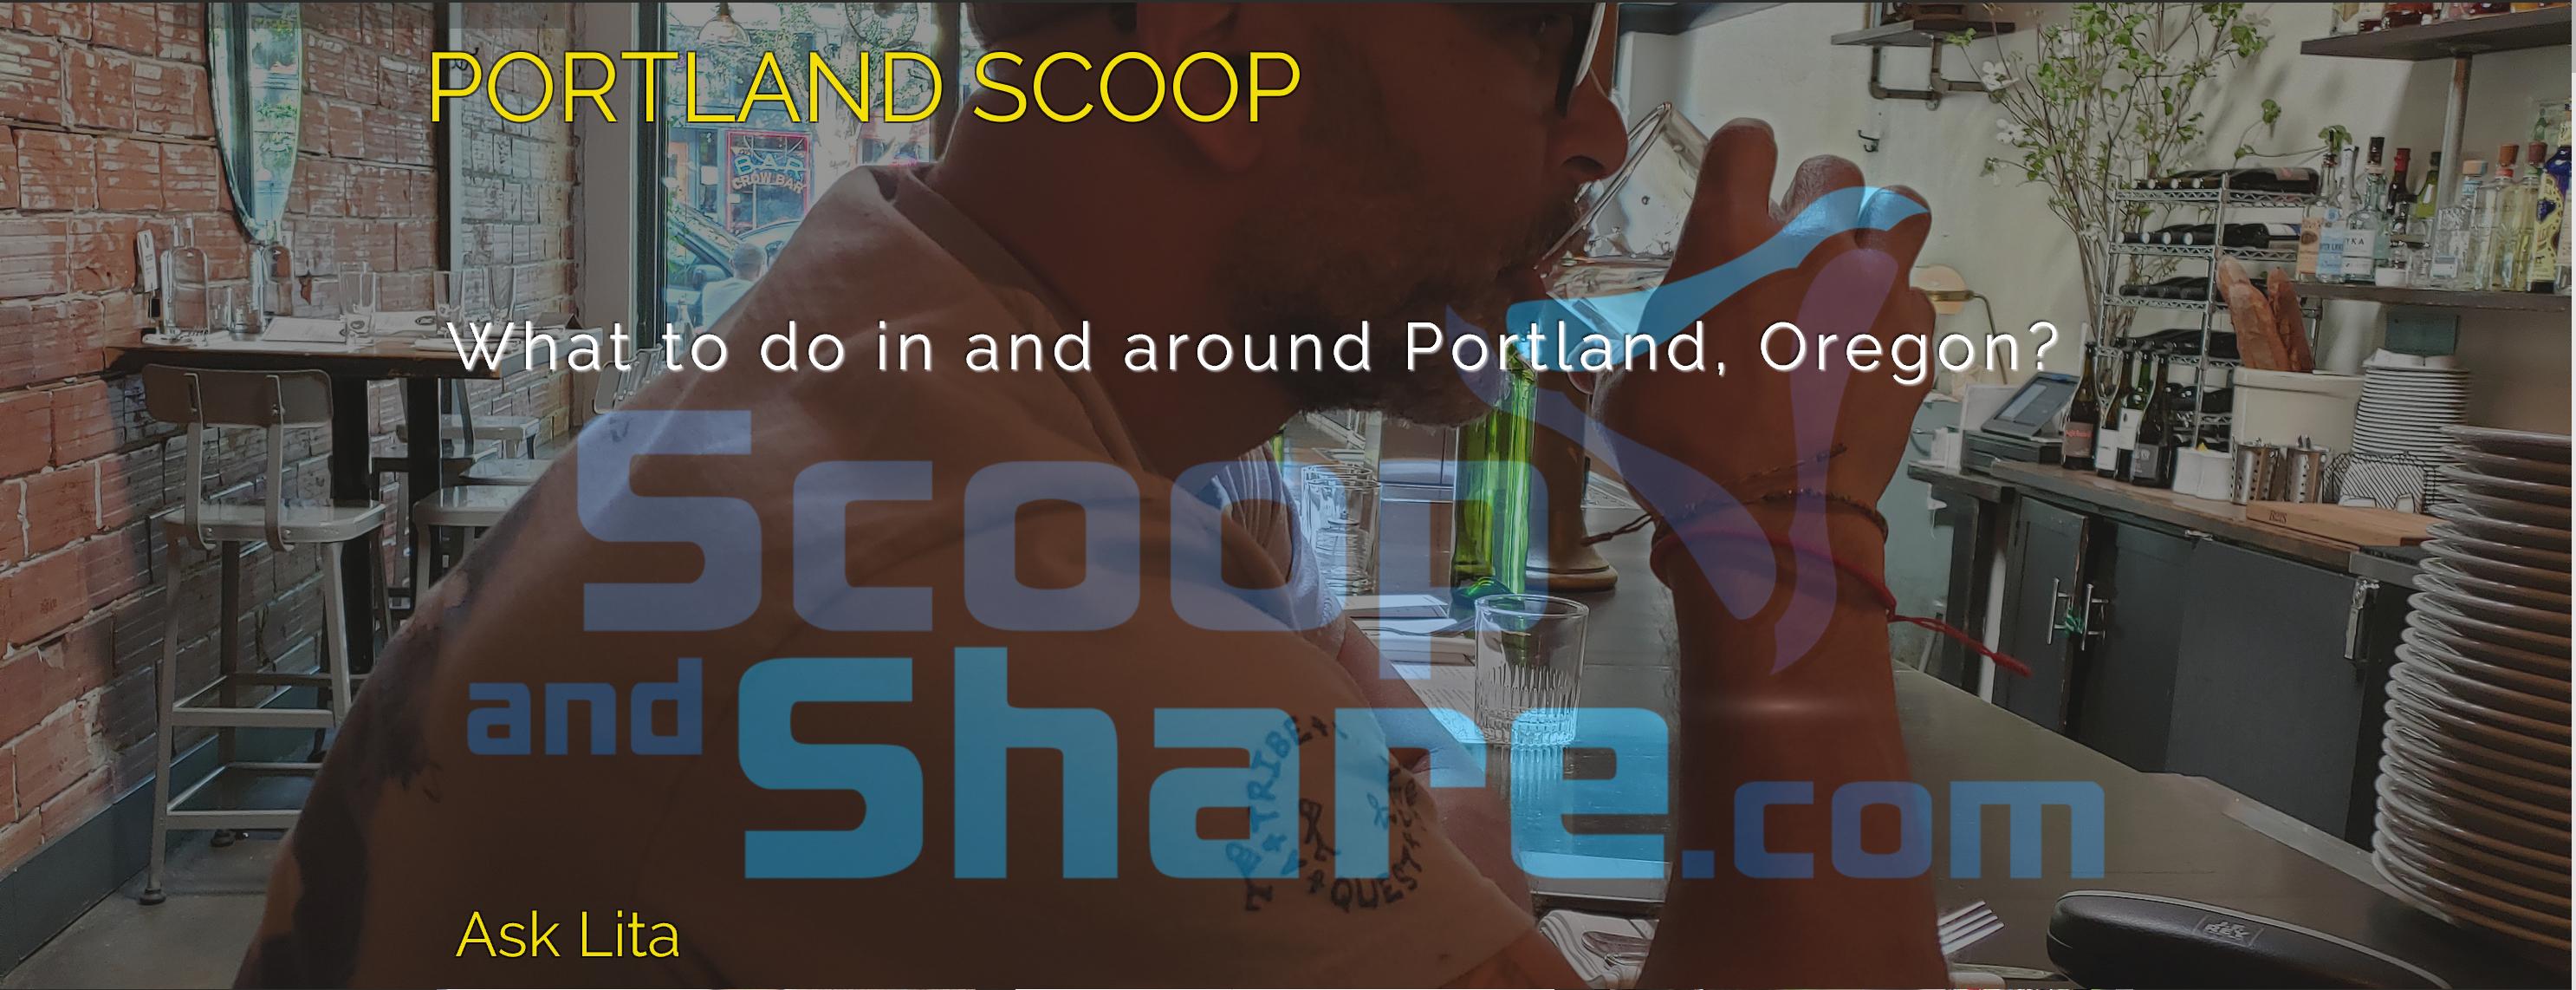 Portland Scoop Image